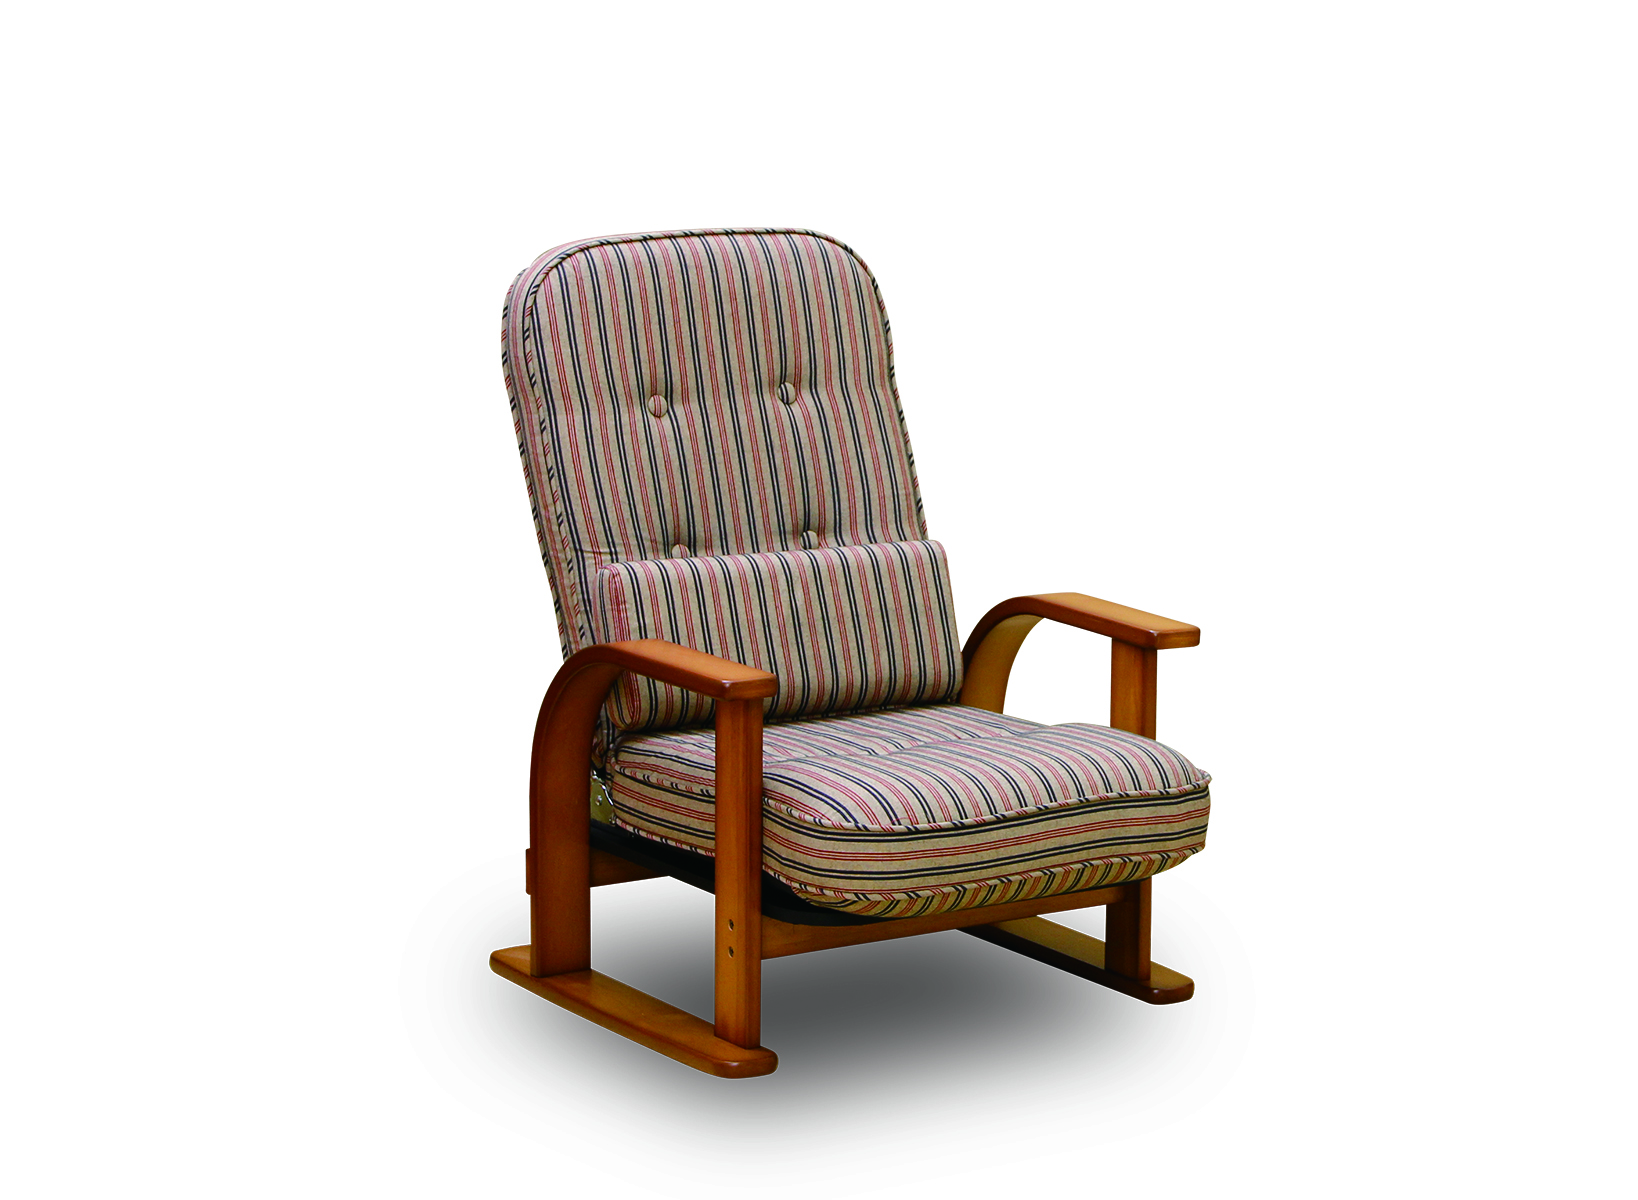 [NK-2220]肘付き高座椅子 4段階調整 ロータイプ